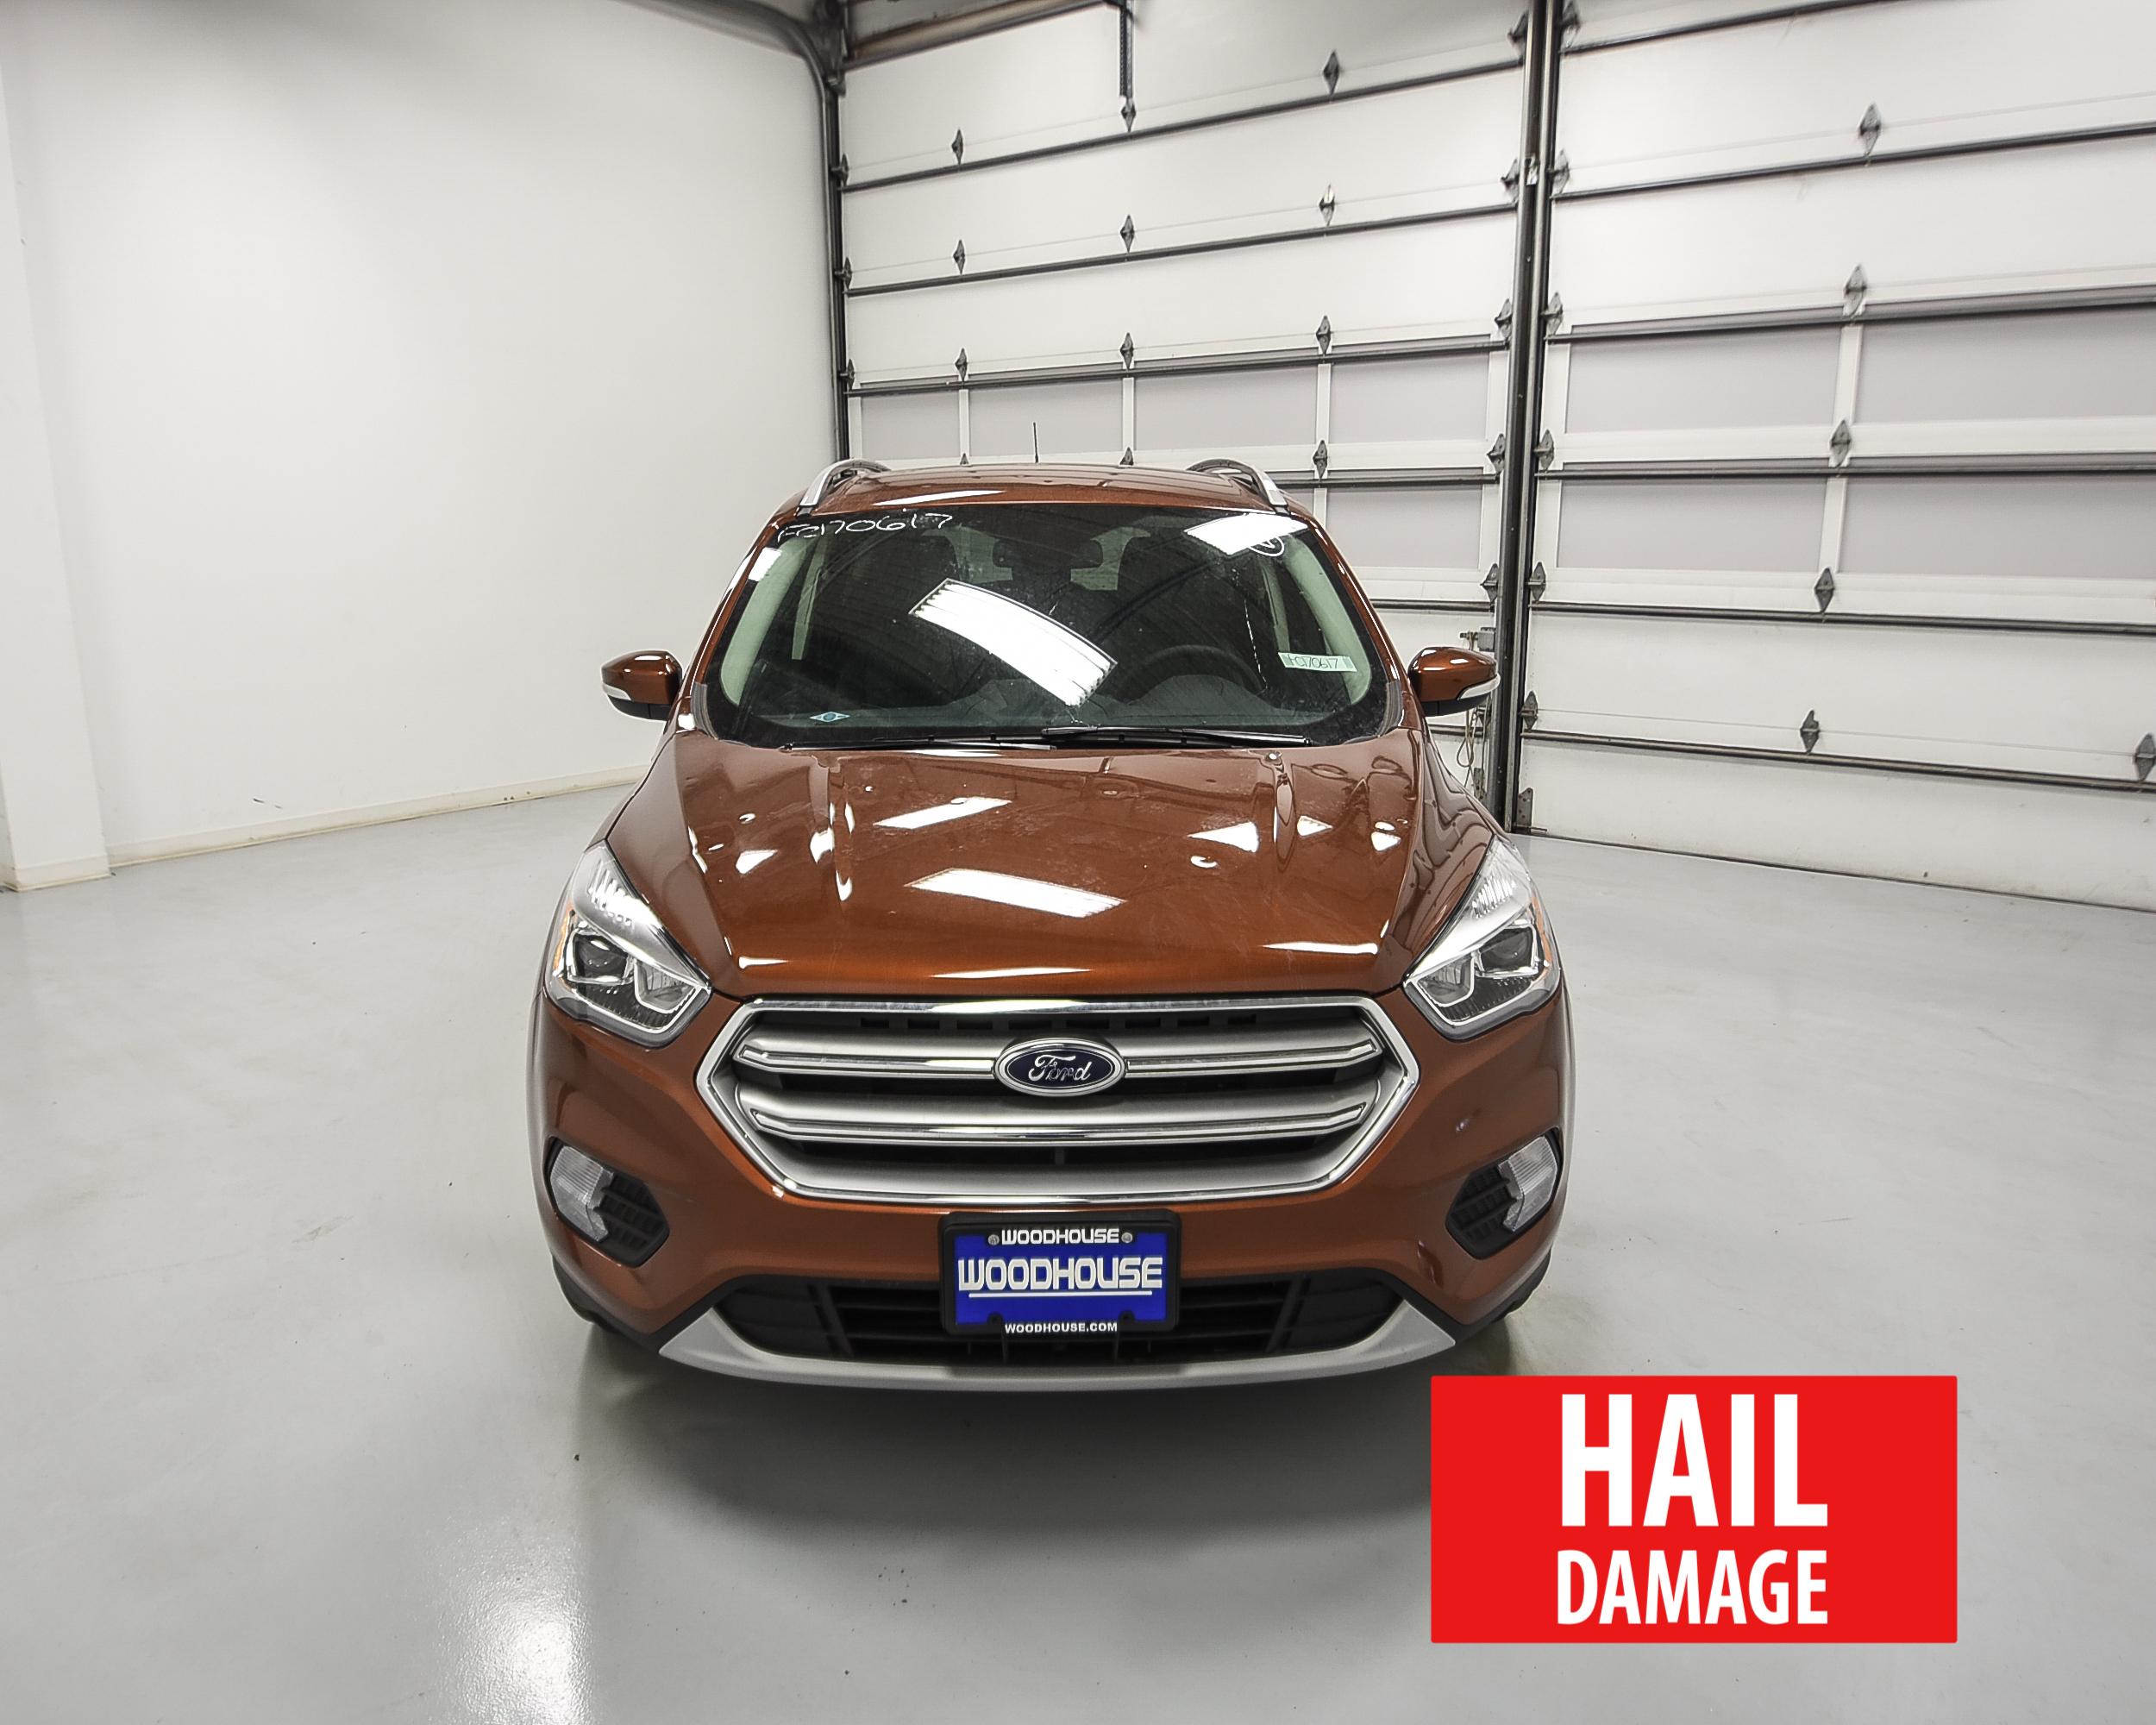 Woodhouse Hail Damage >> Woodhouse Auto Family Hail Damage.html | Autos Post